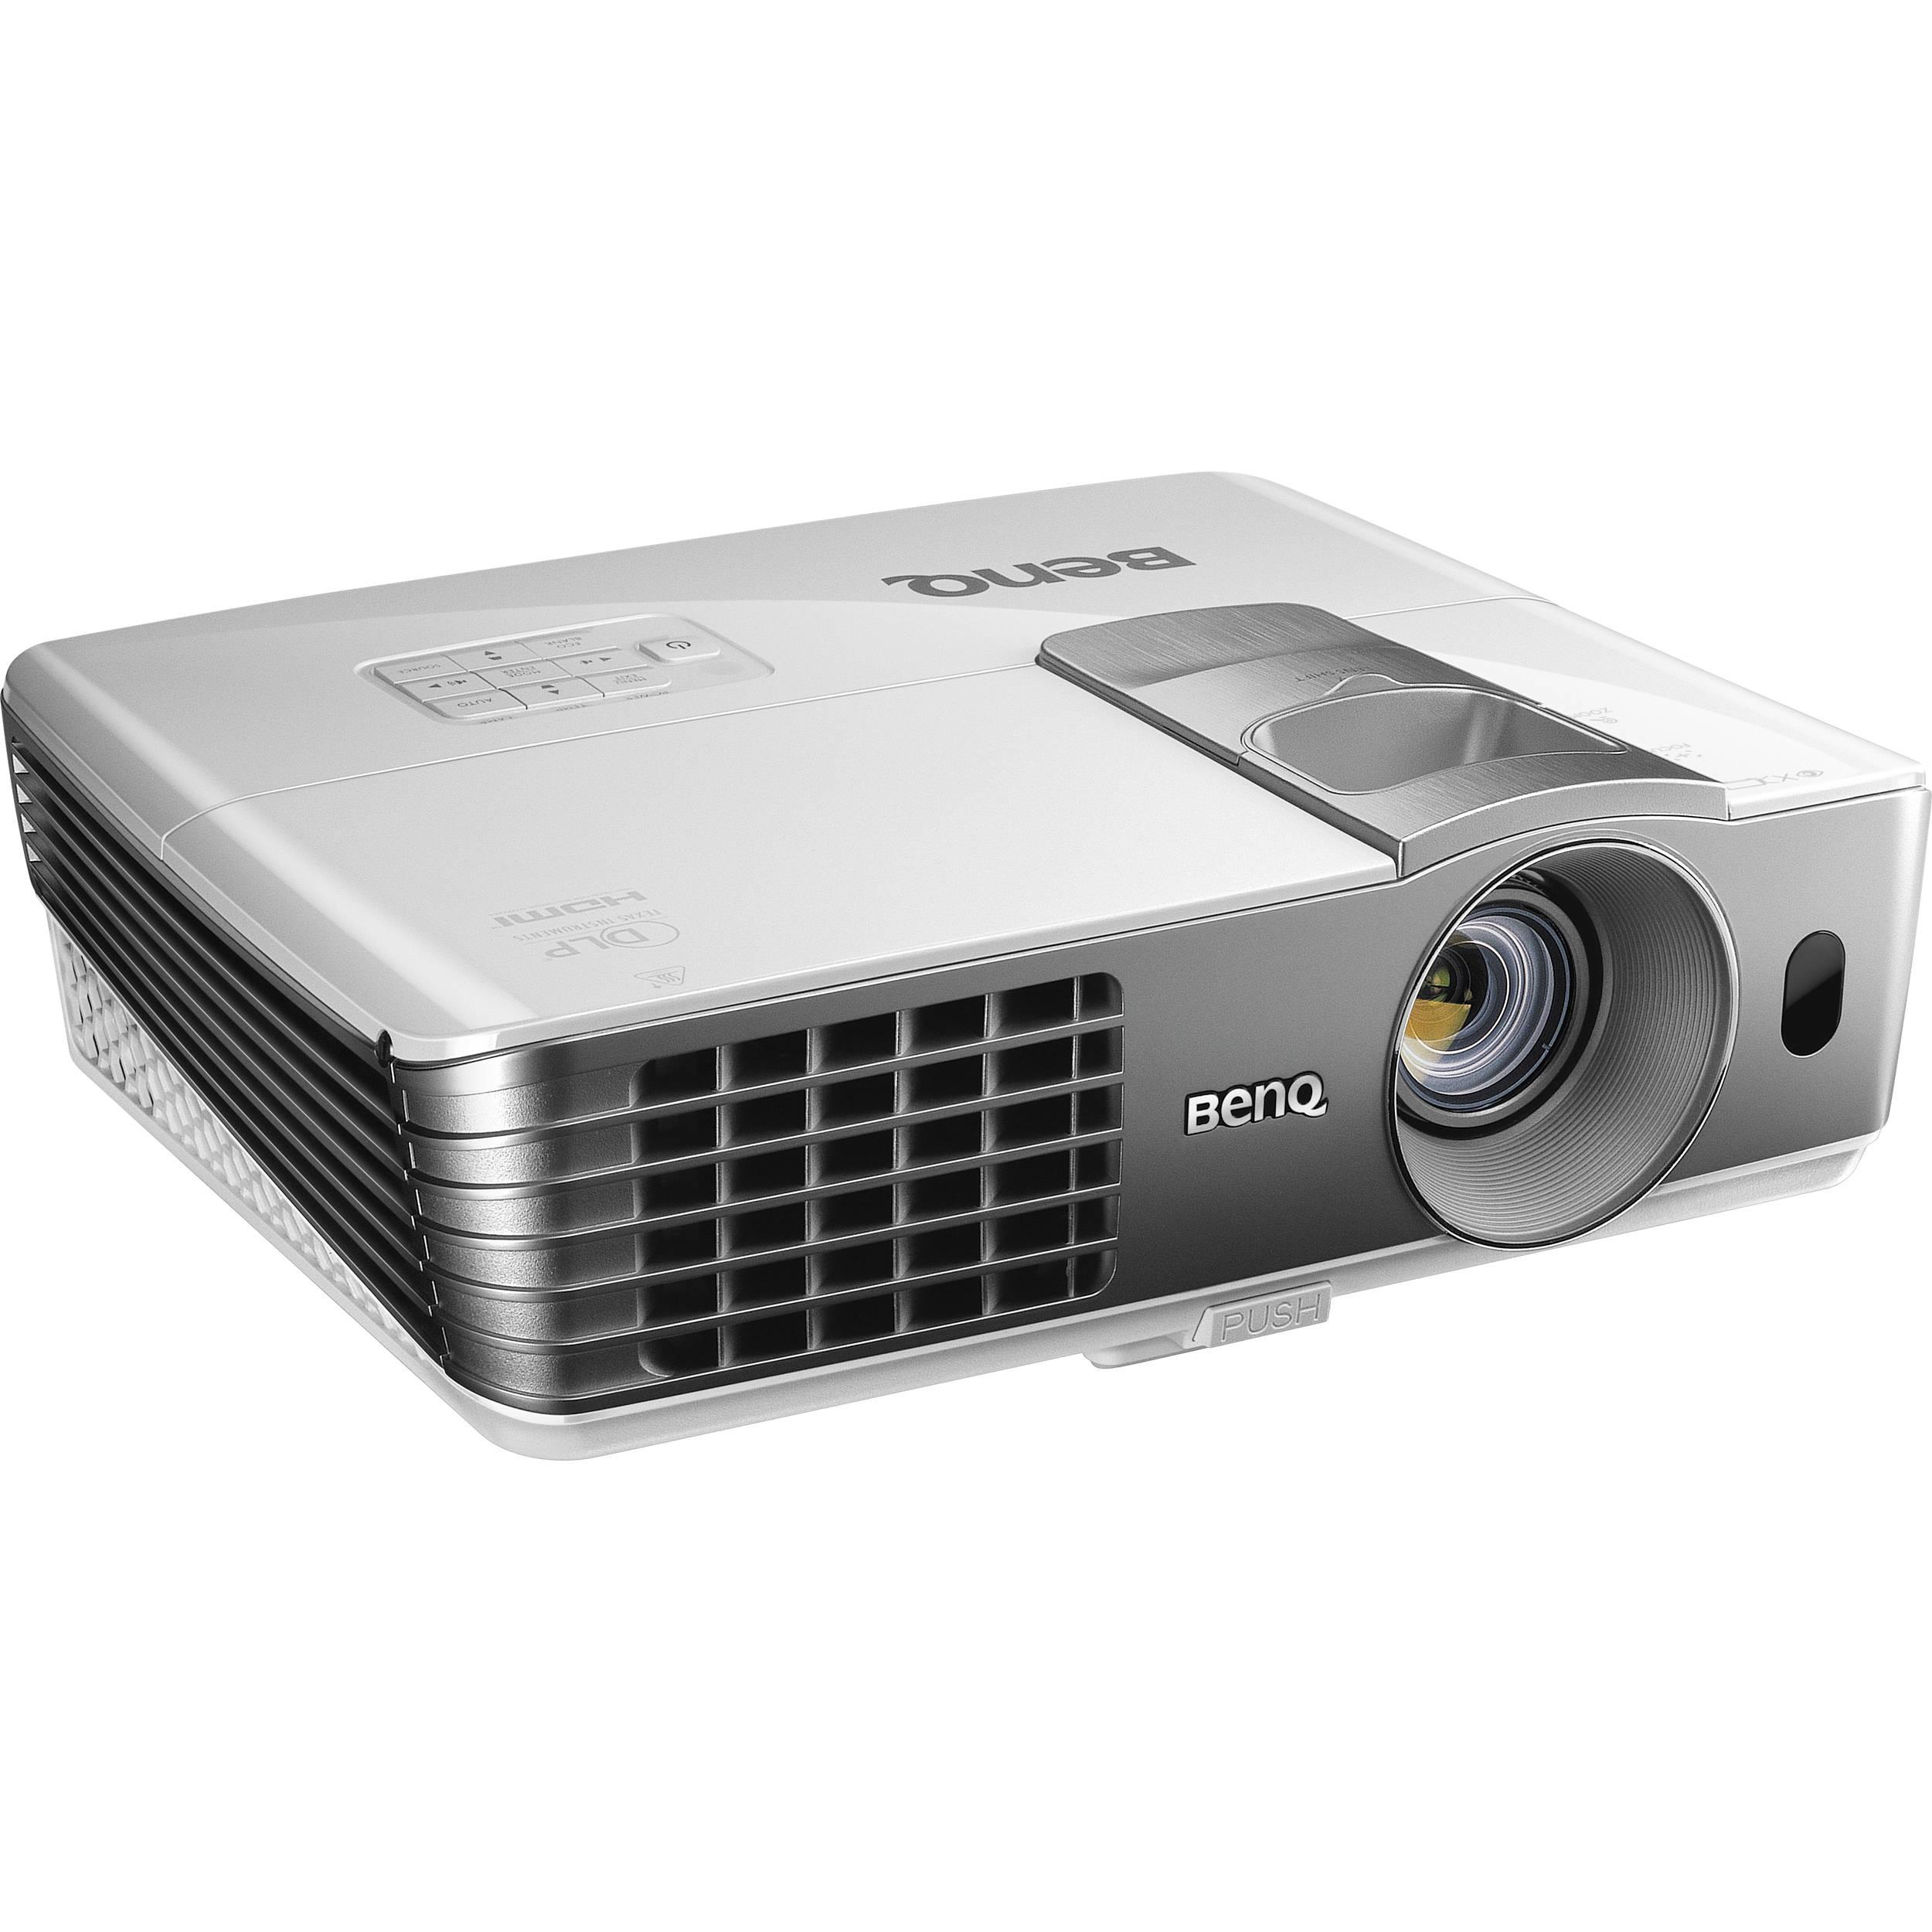 Benq W1070 Full Hd 1080p 3d Dlp Home Entertainment Projector